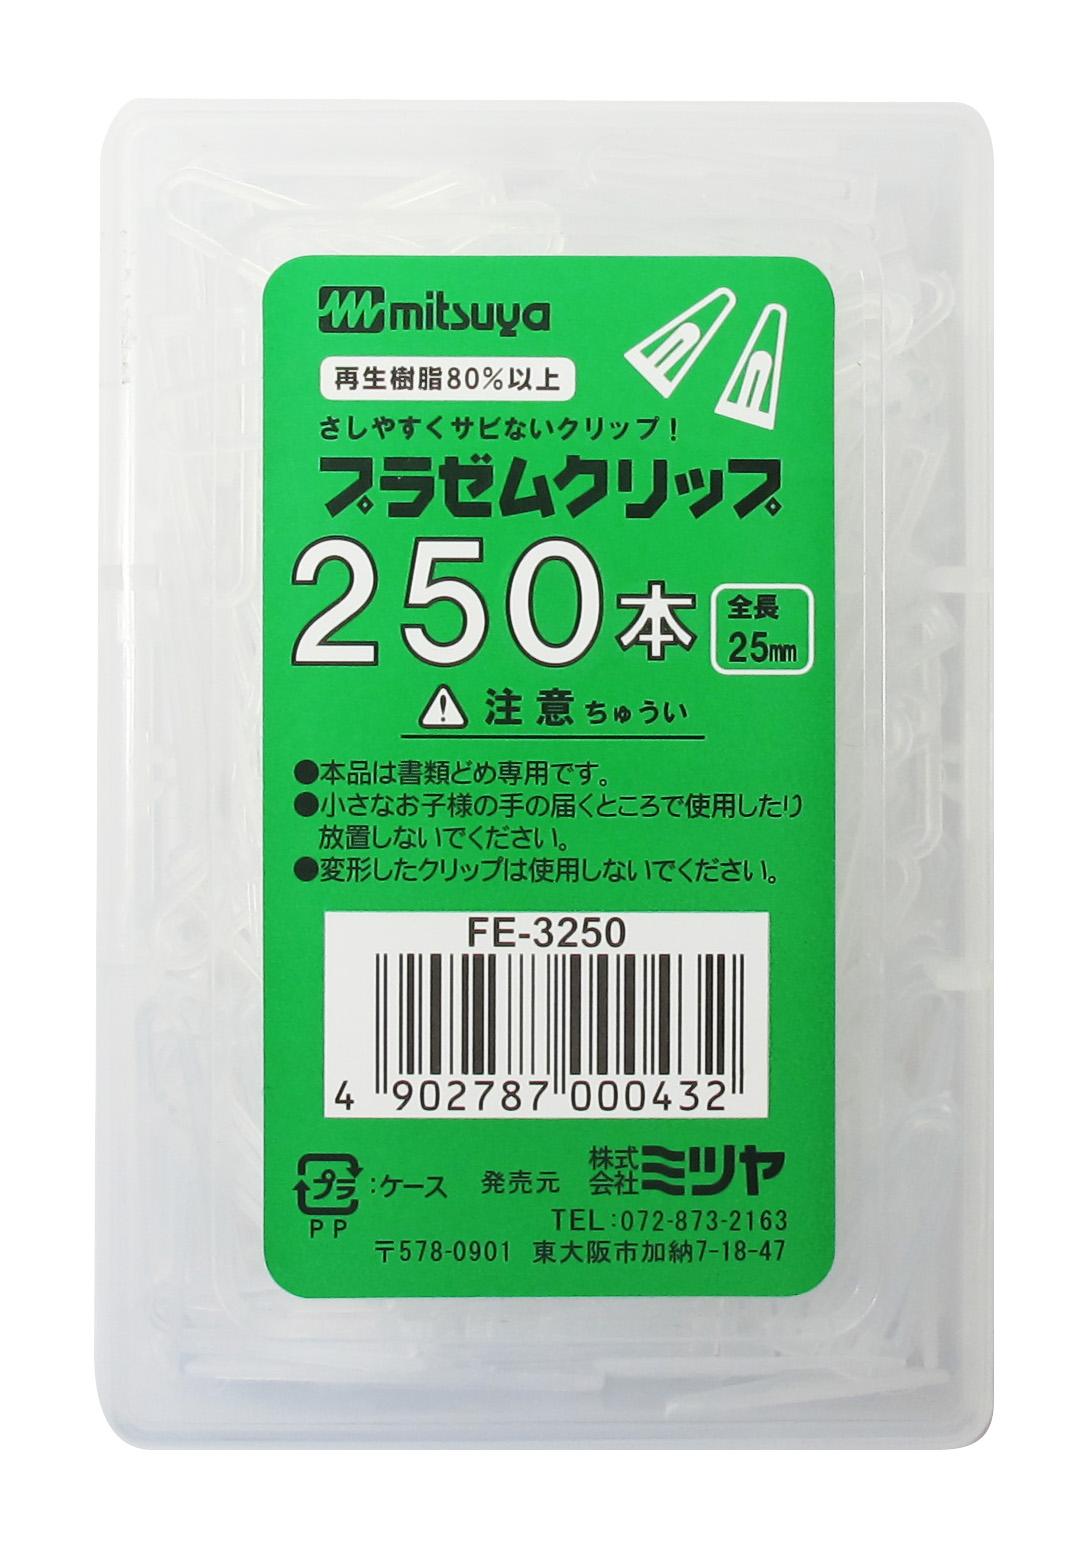 FE-3250